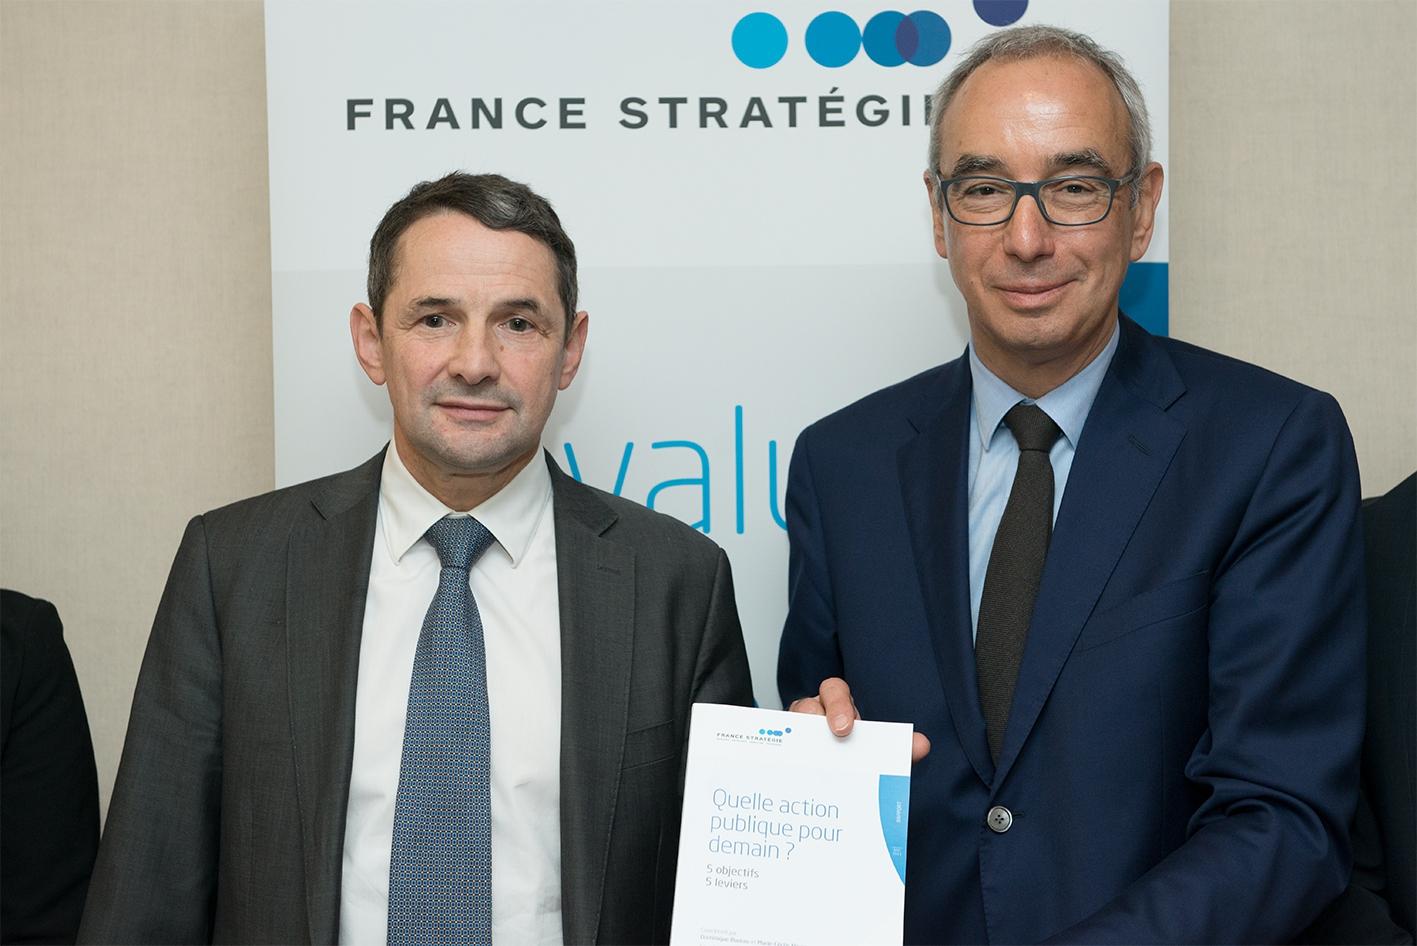 Thierry Mandon, Jean Pisani-Ferry